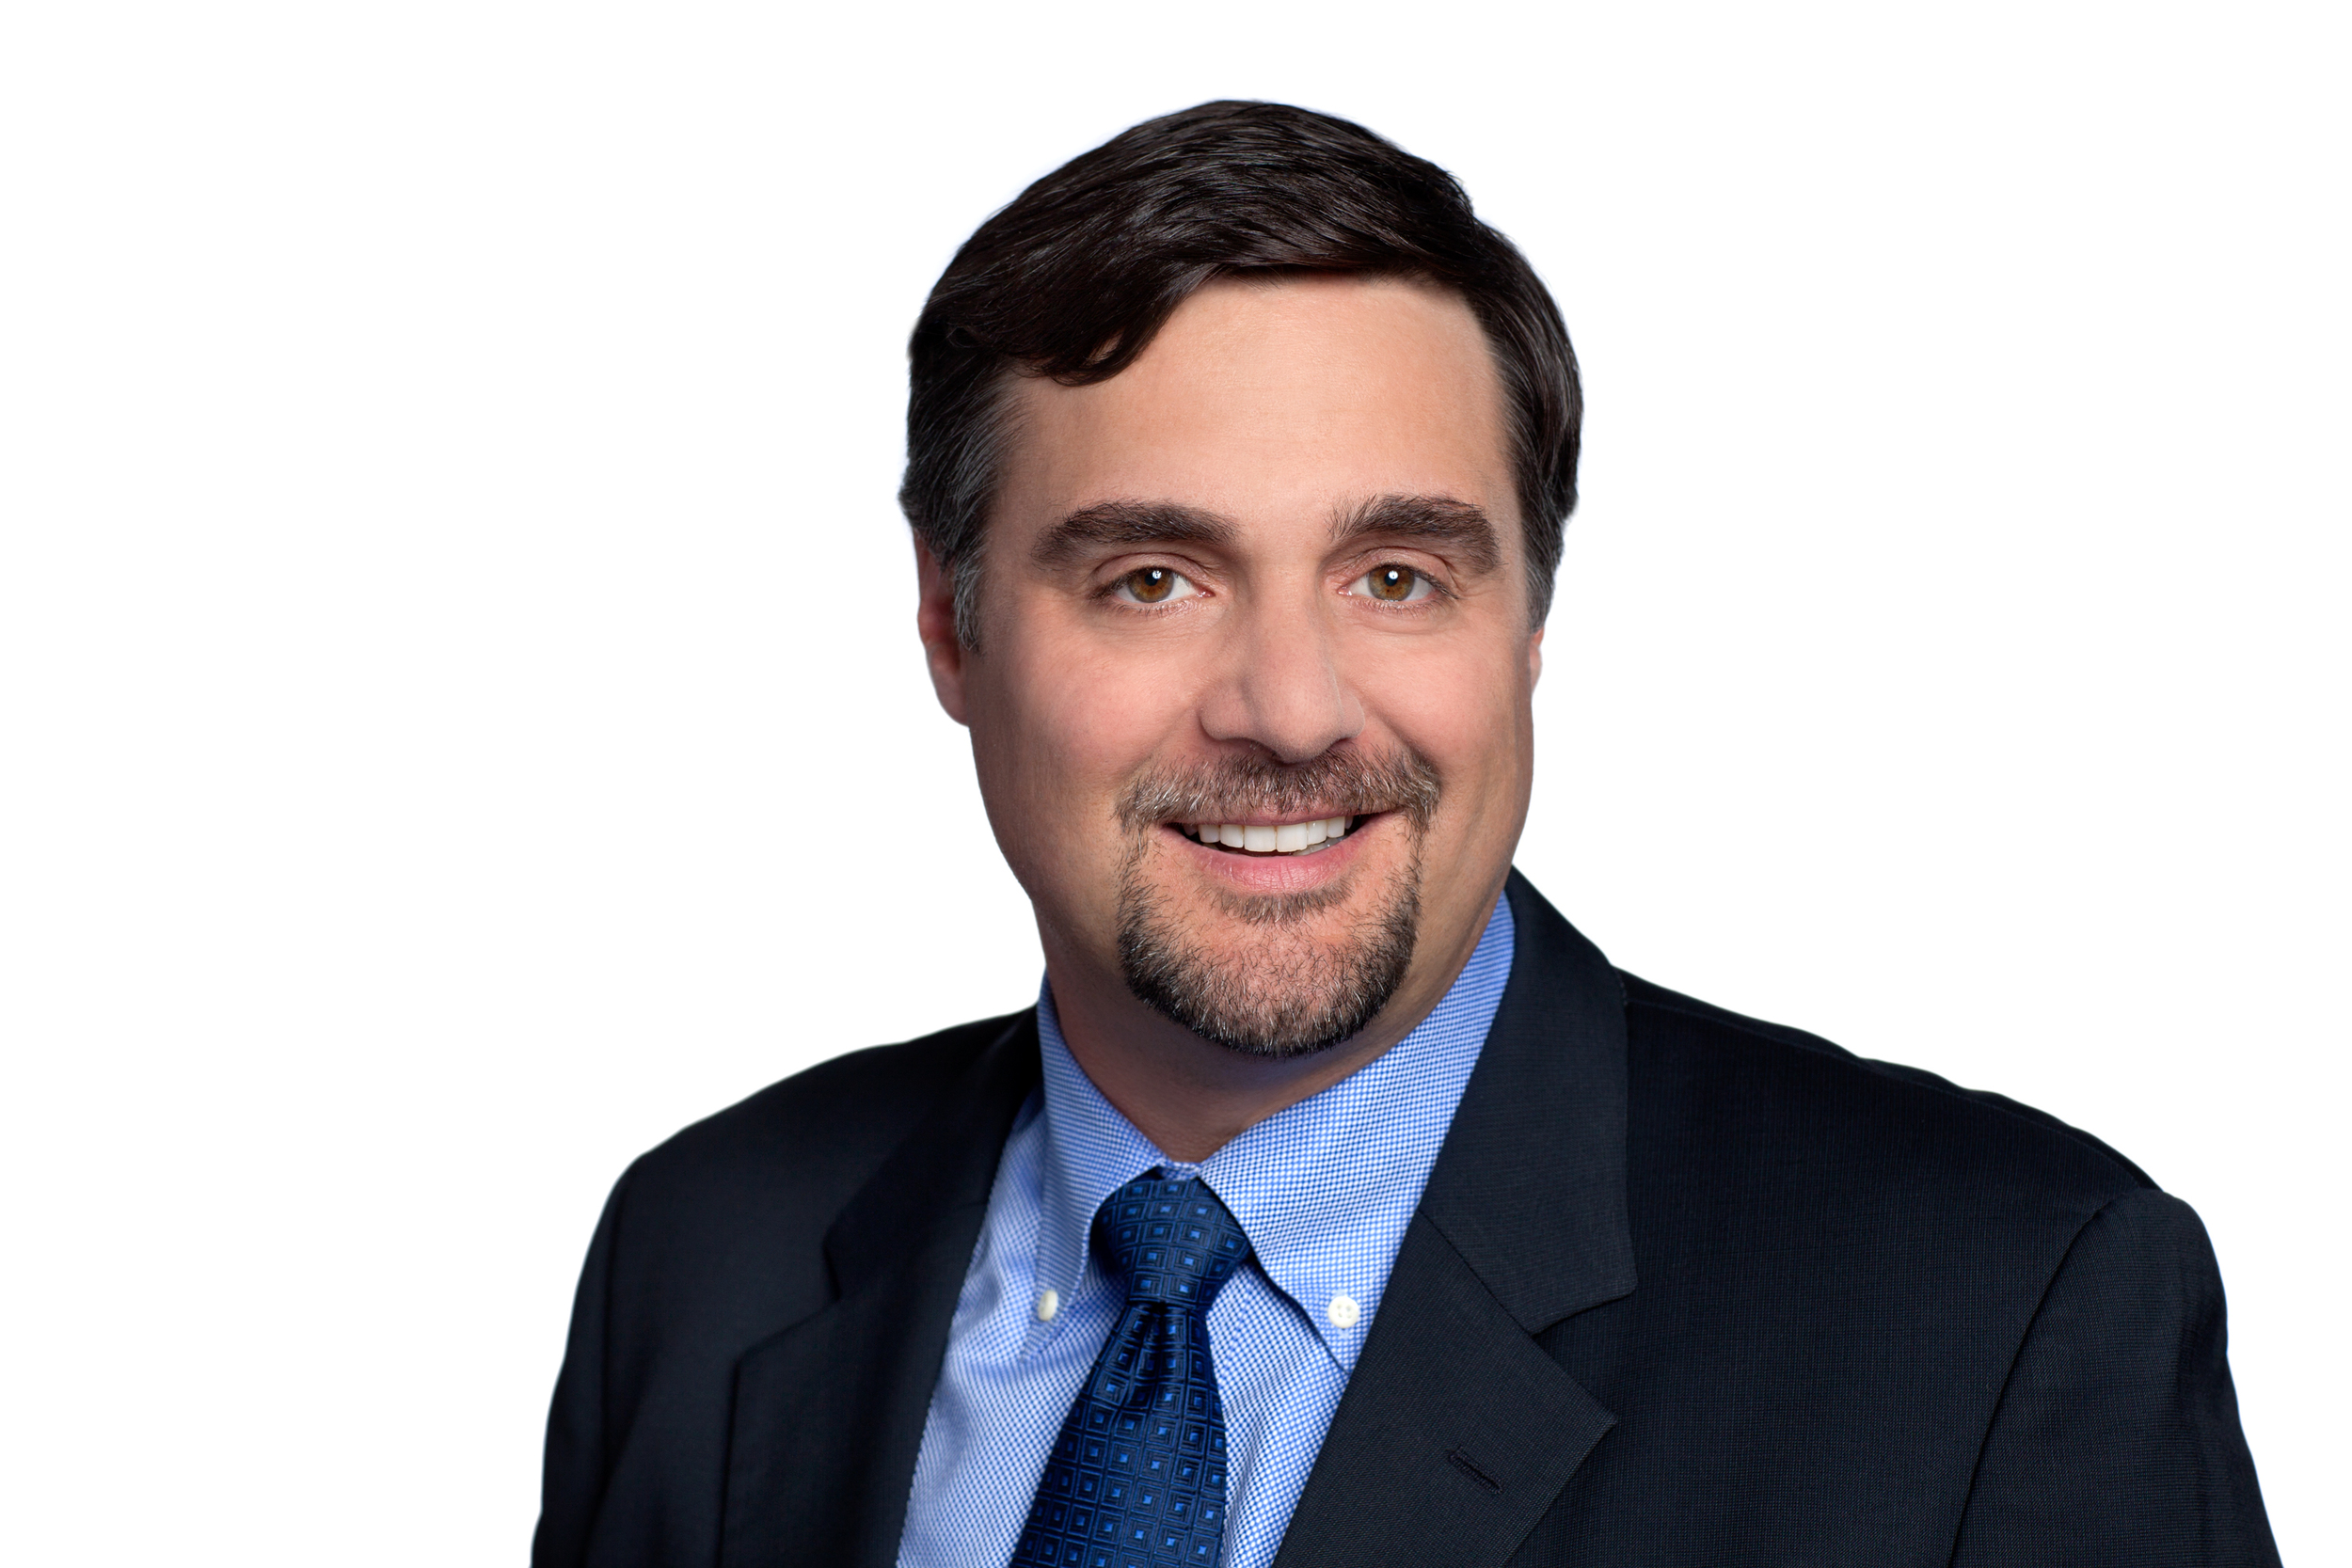 Michael Raneri